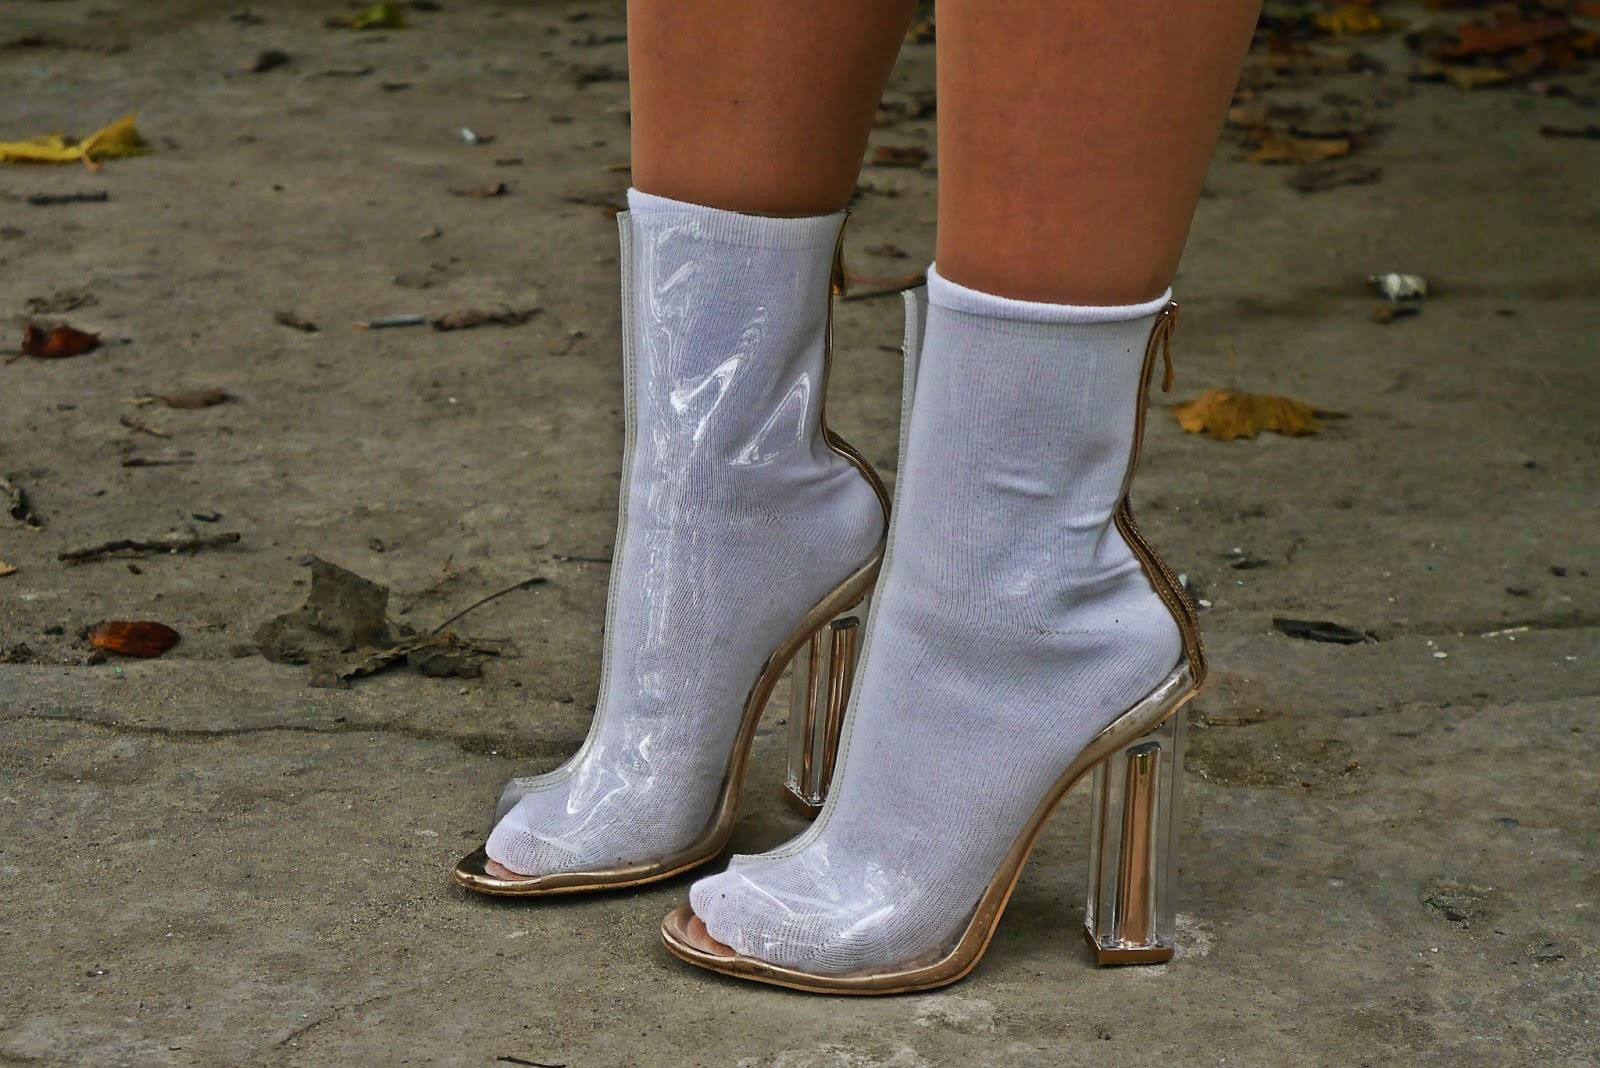 11_yezzy_shoes_plastic_boots_transparent_karyn_blog_modowy_191017